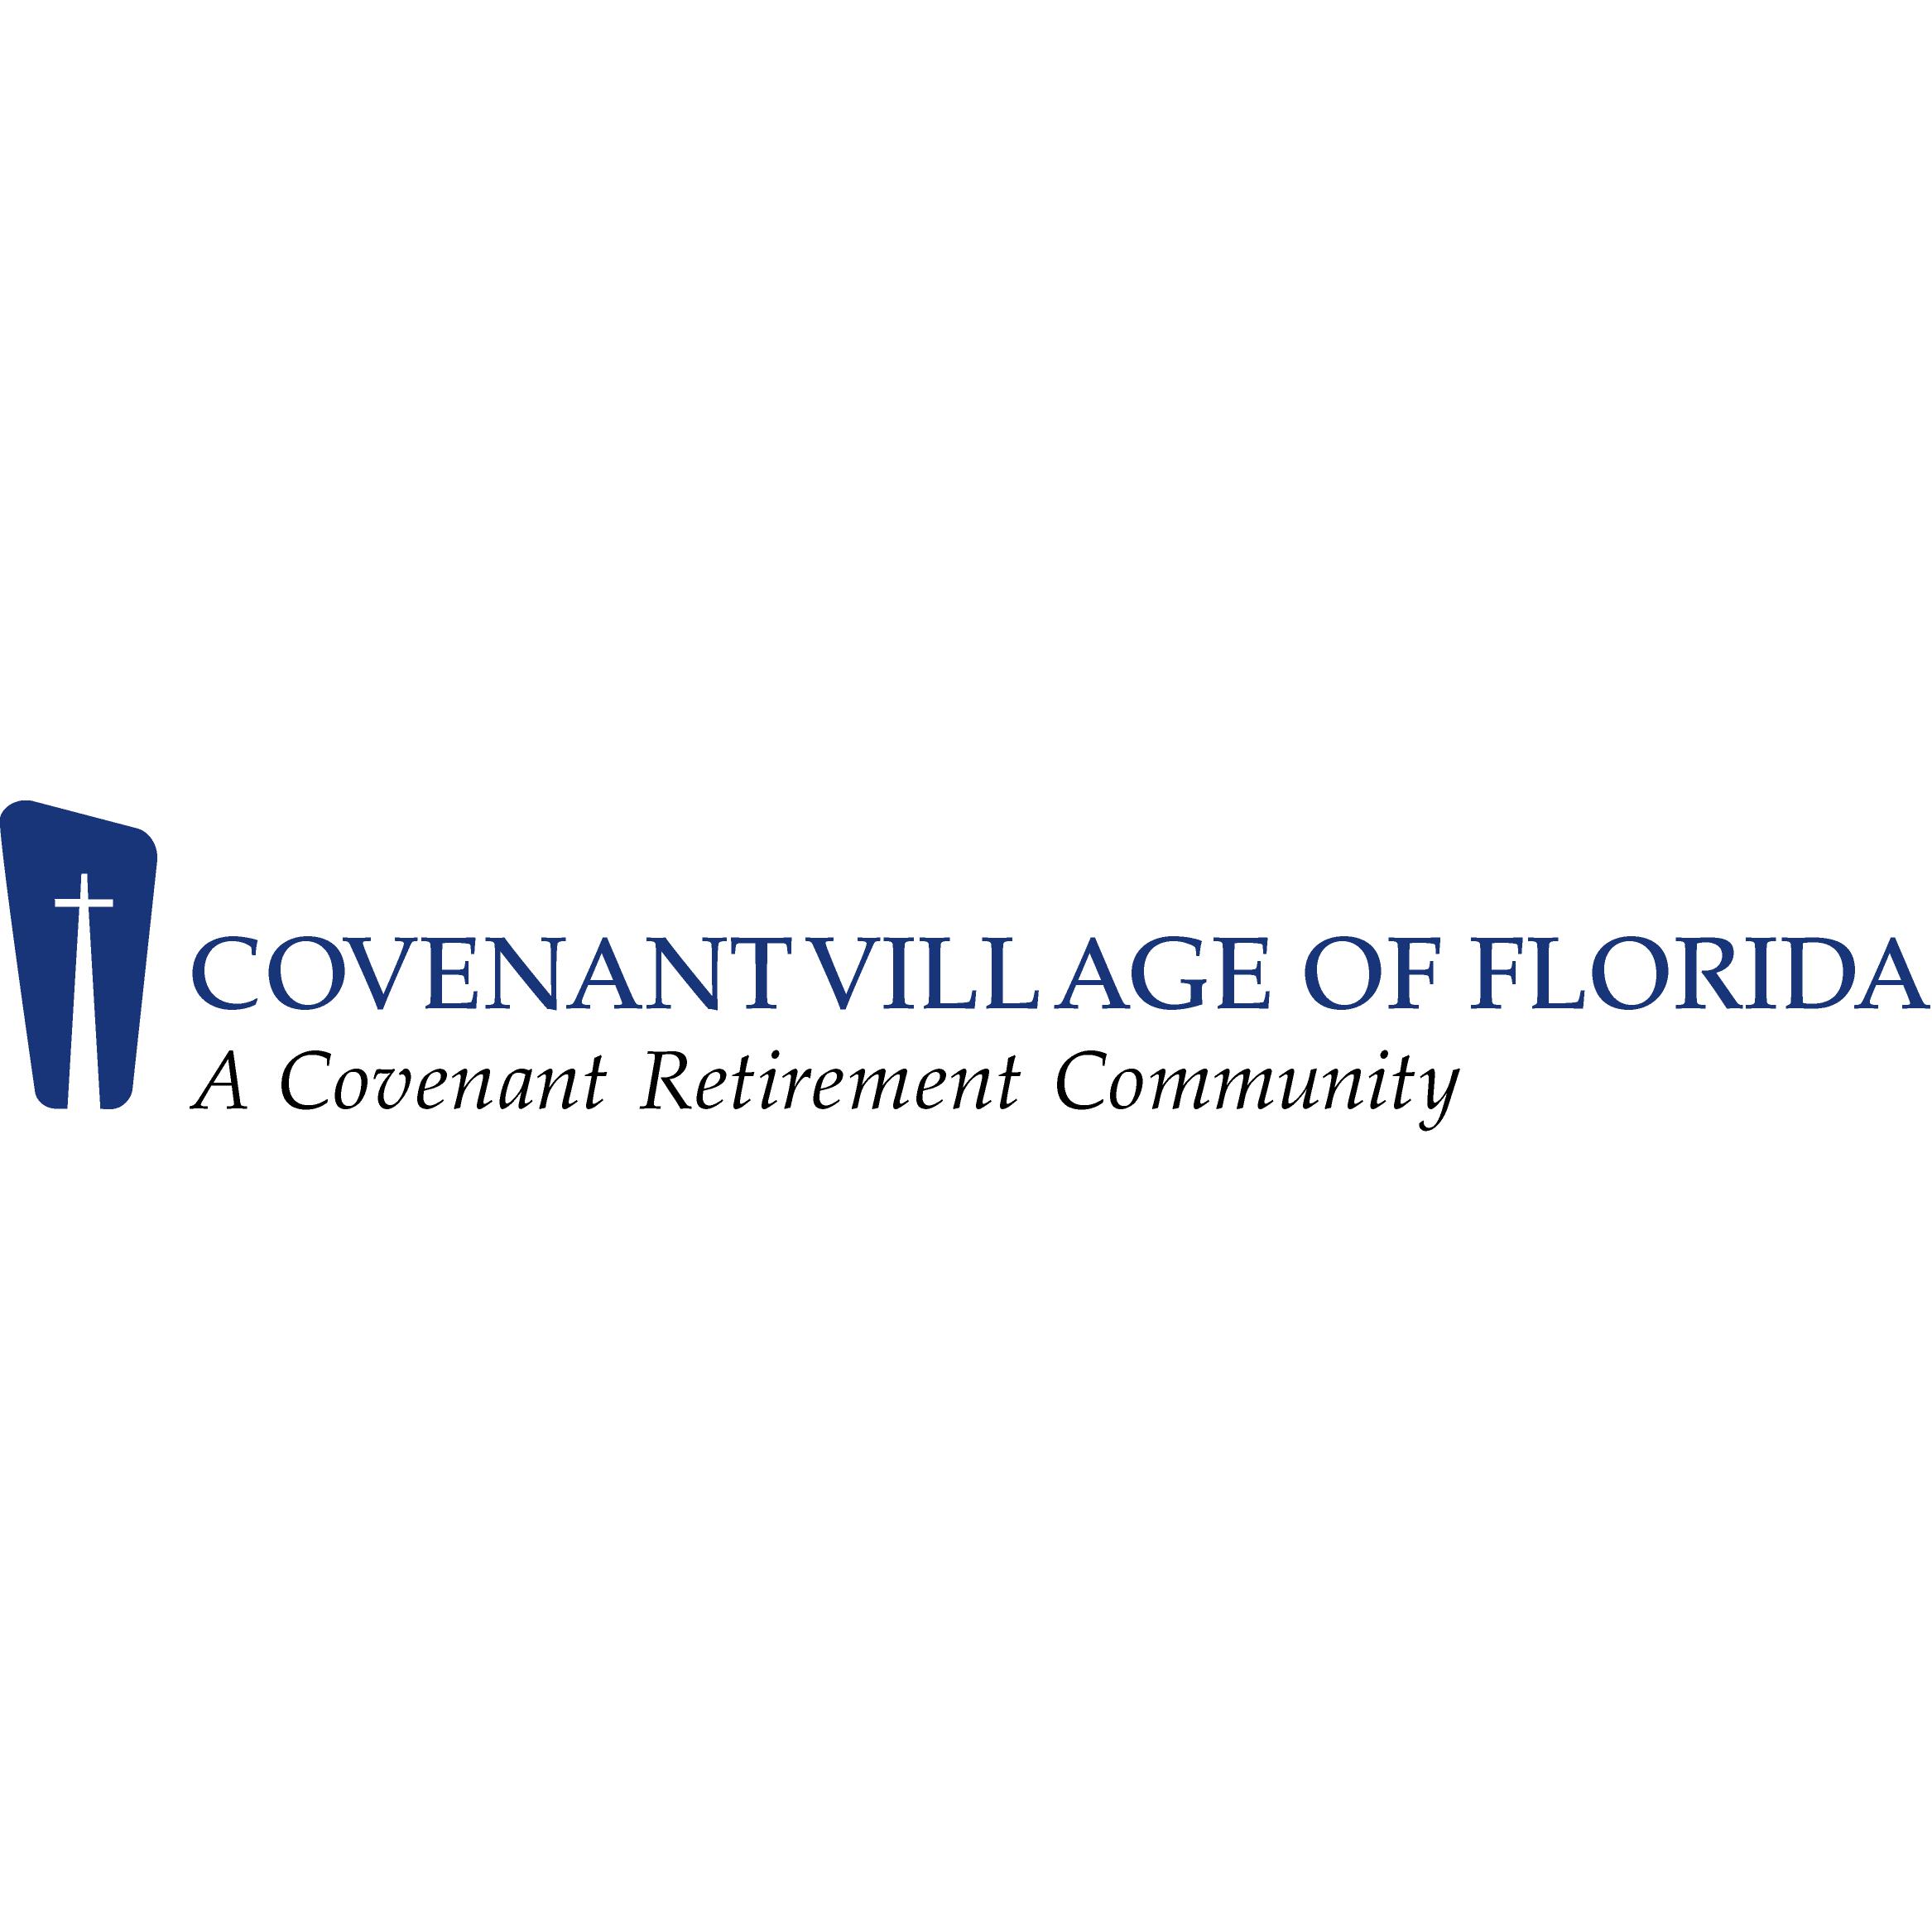 Covenant Village of Florida